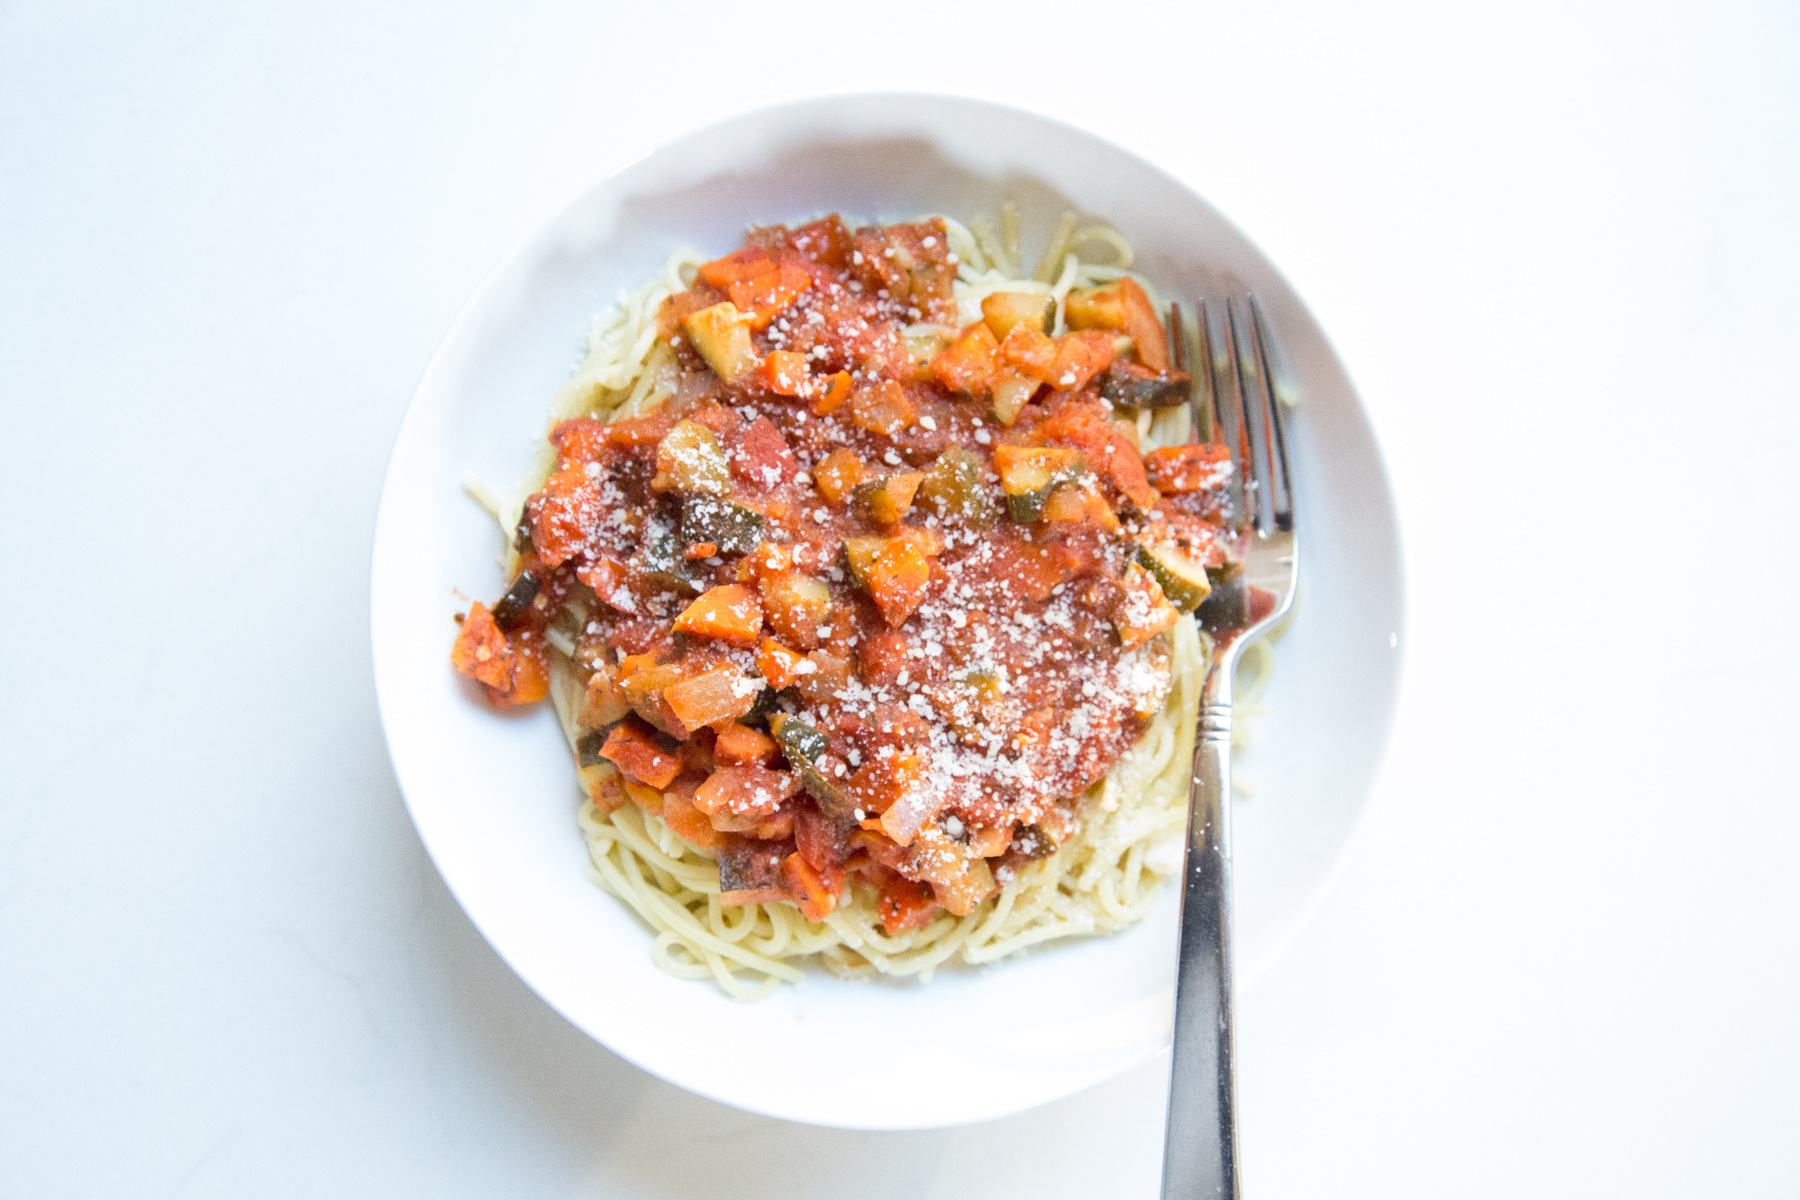 vegetable ragu with pasta